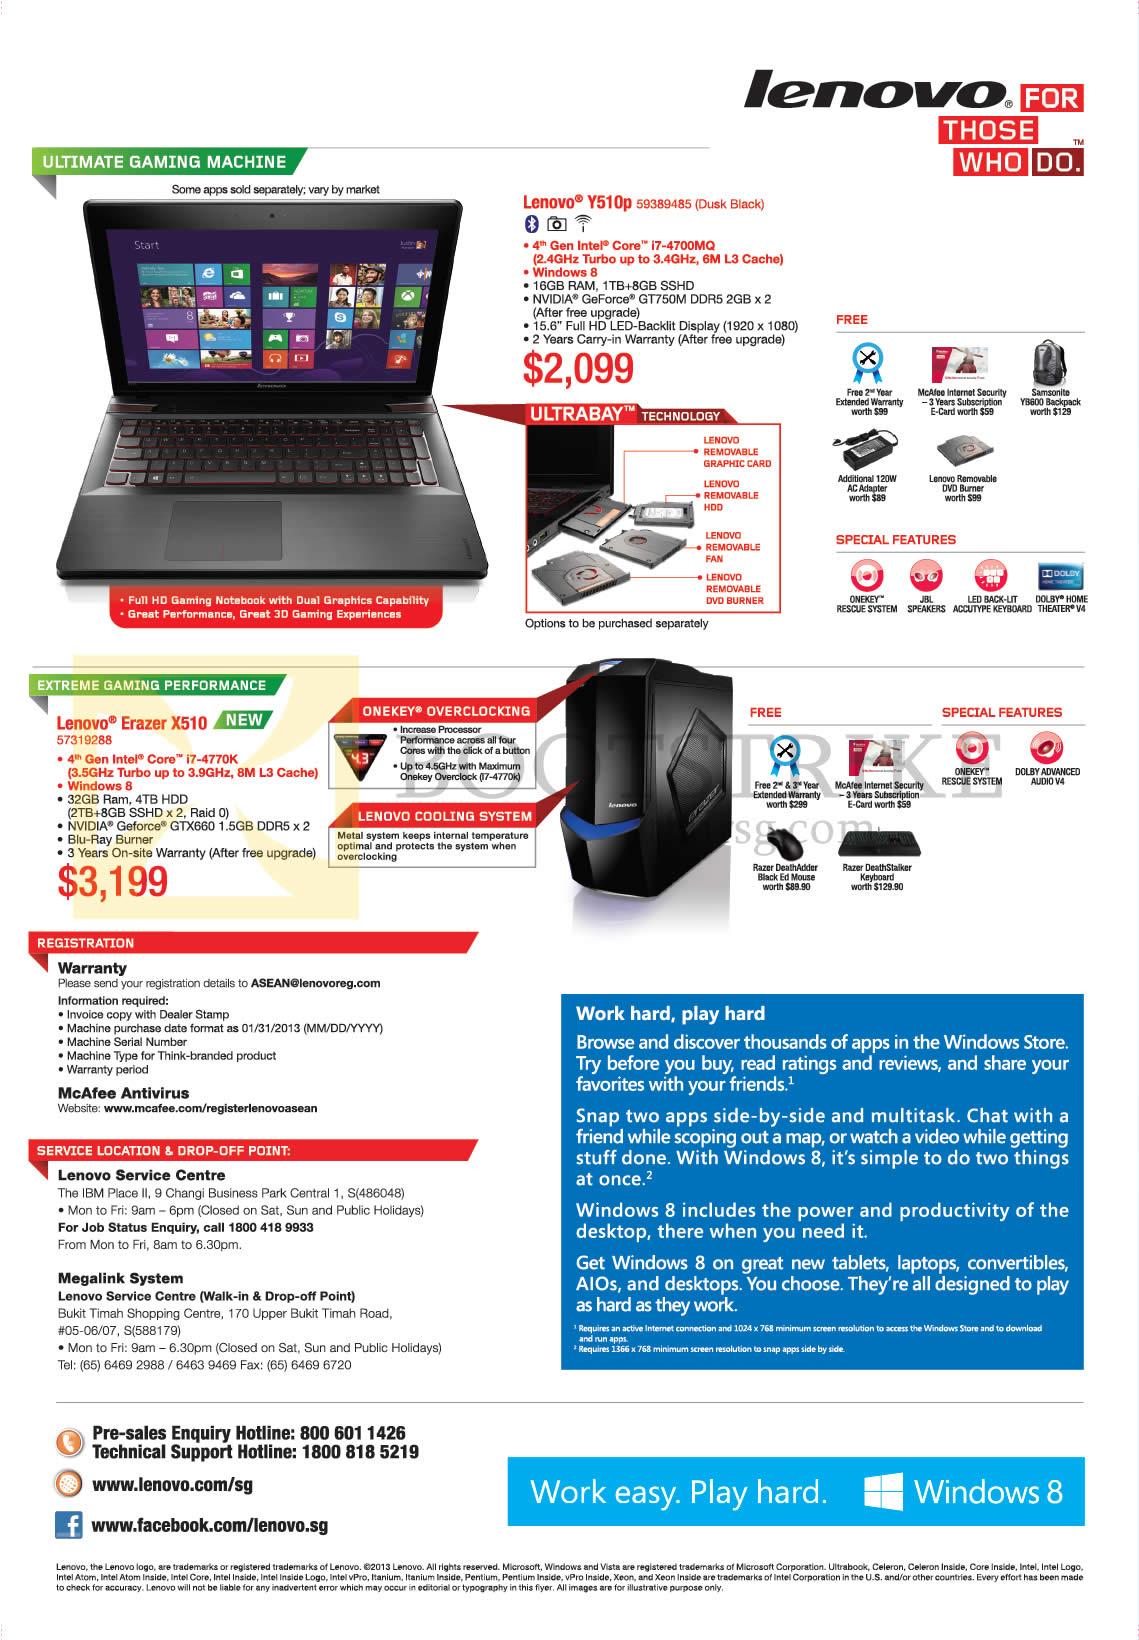 Lenovo Notebook Gaming Y510p, Desktop PC Erazer X510